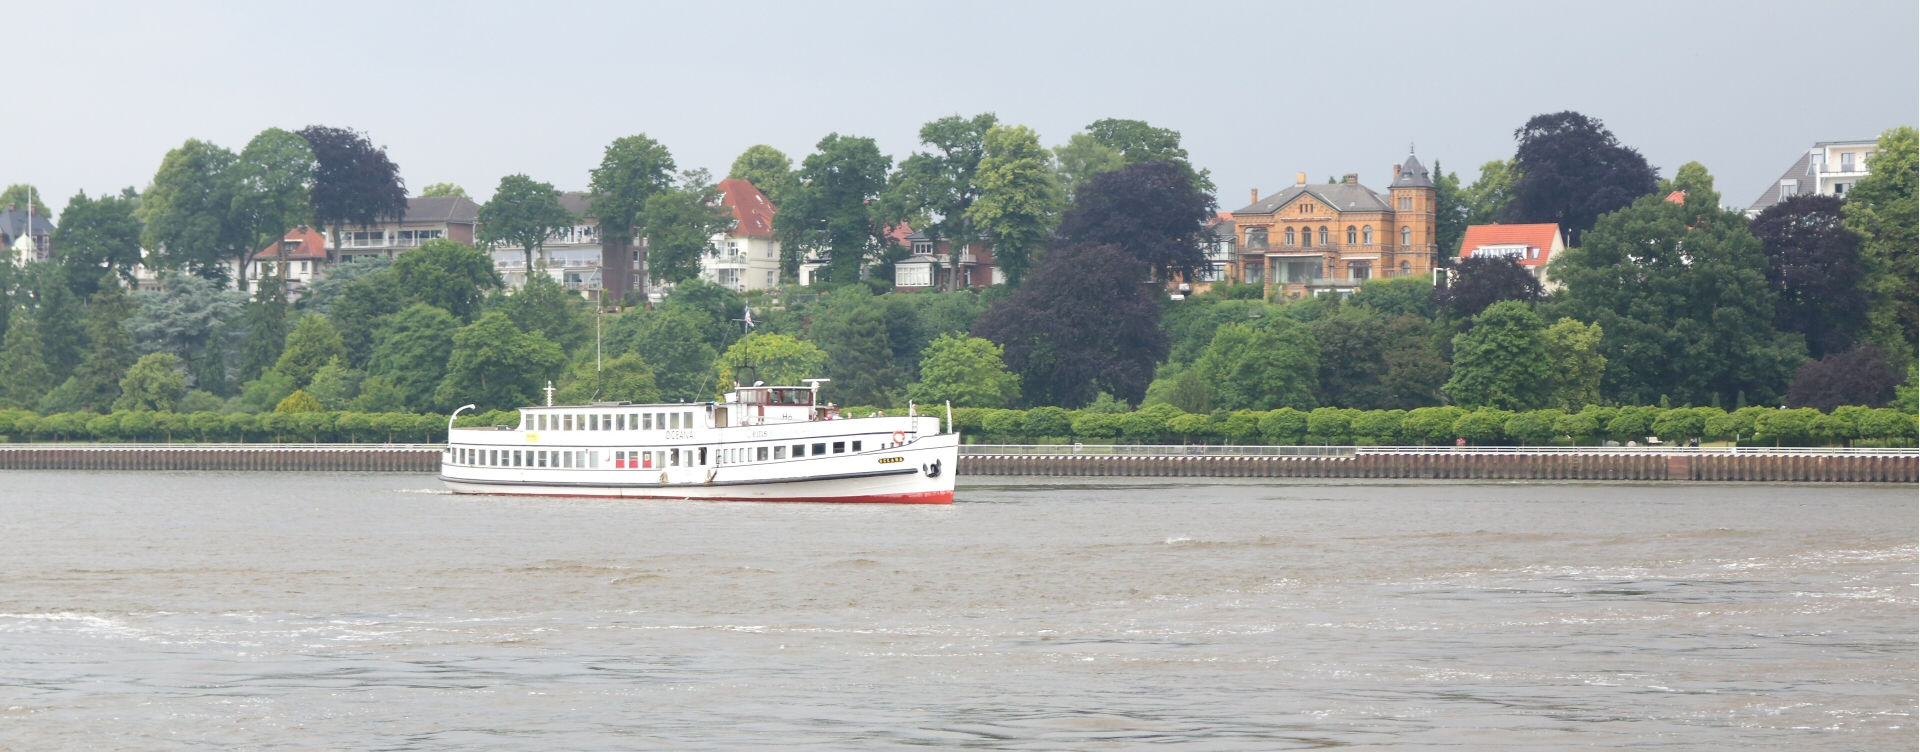 Weserfahrten - vegesack.de